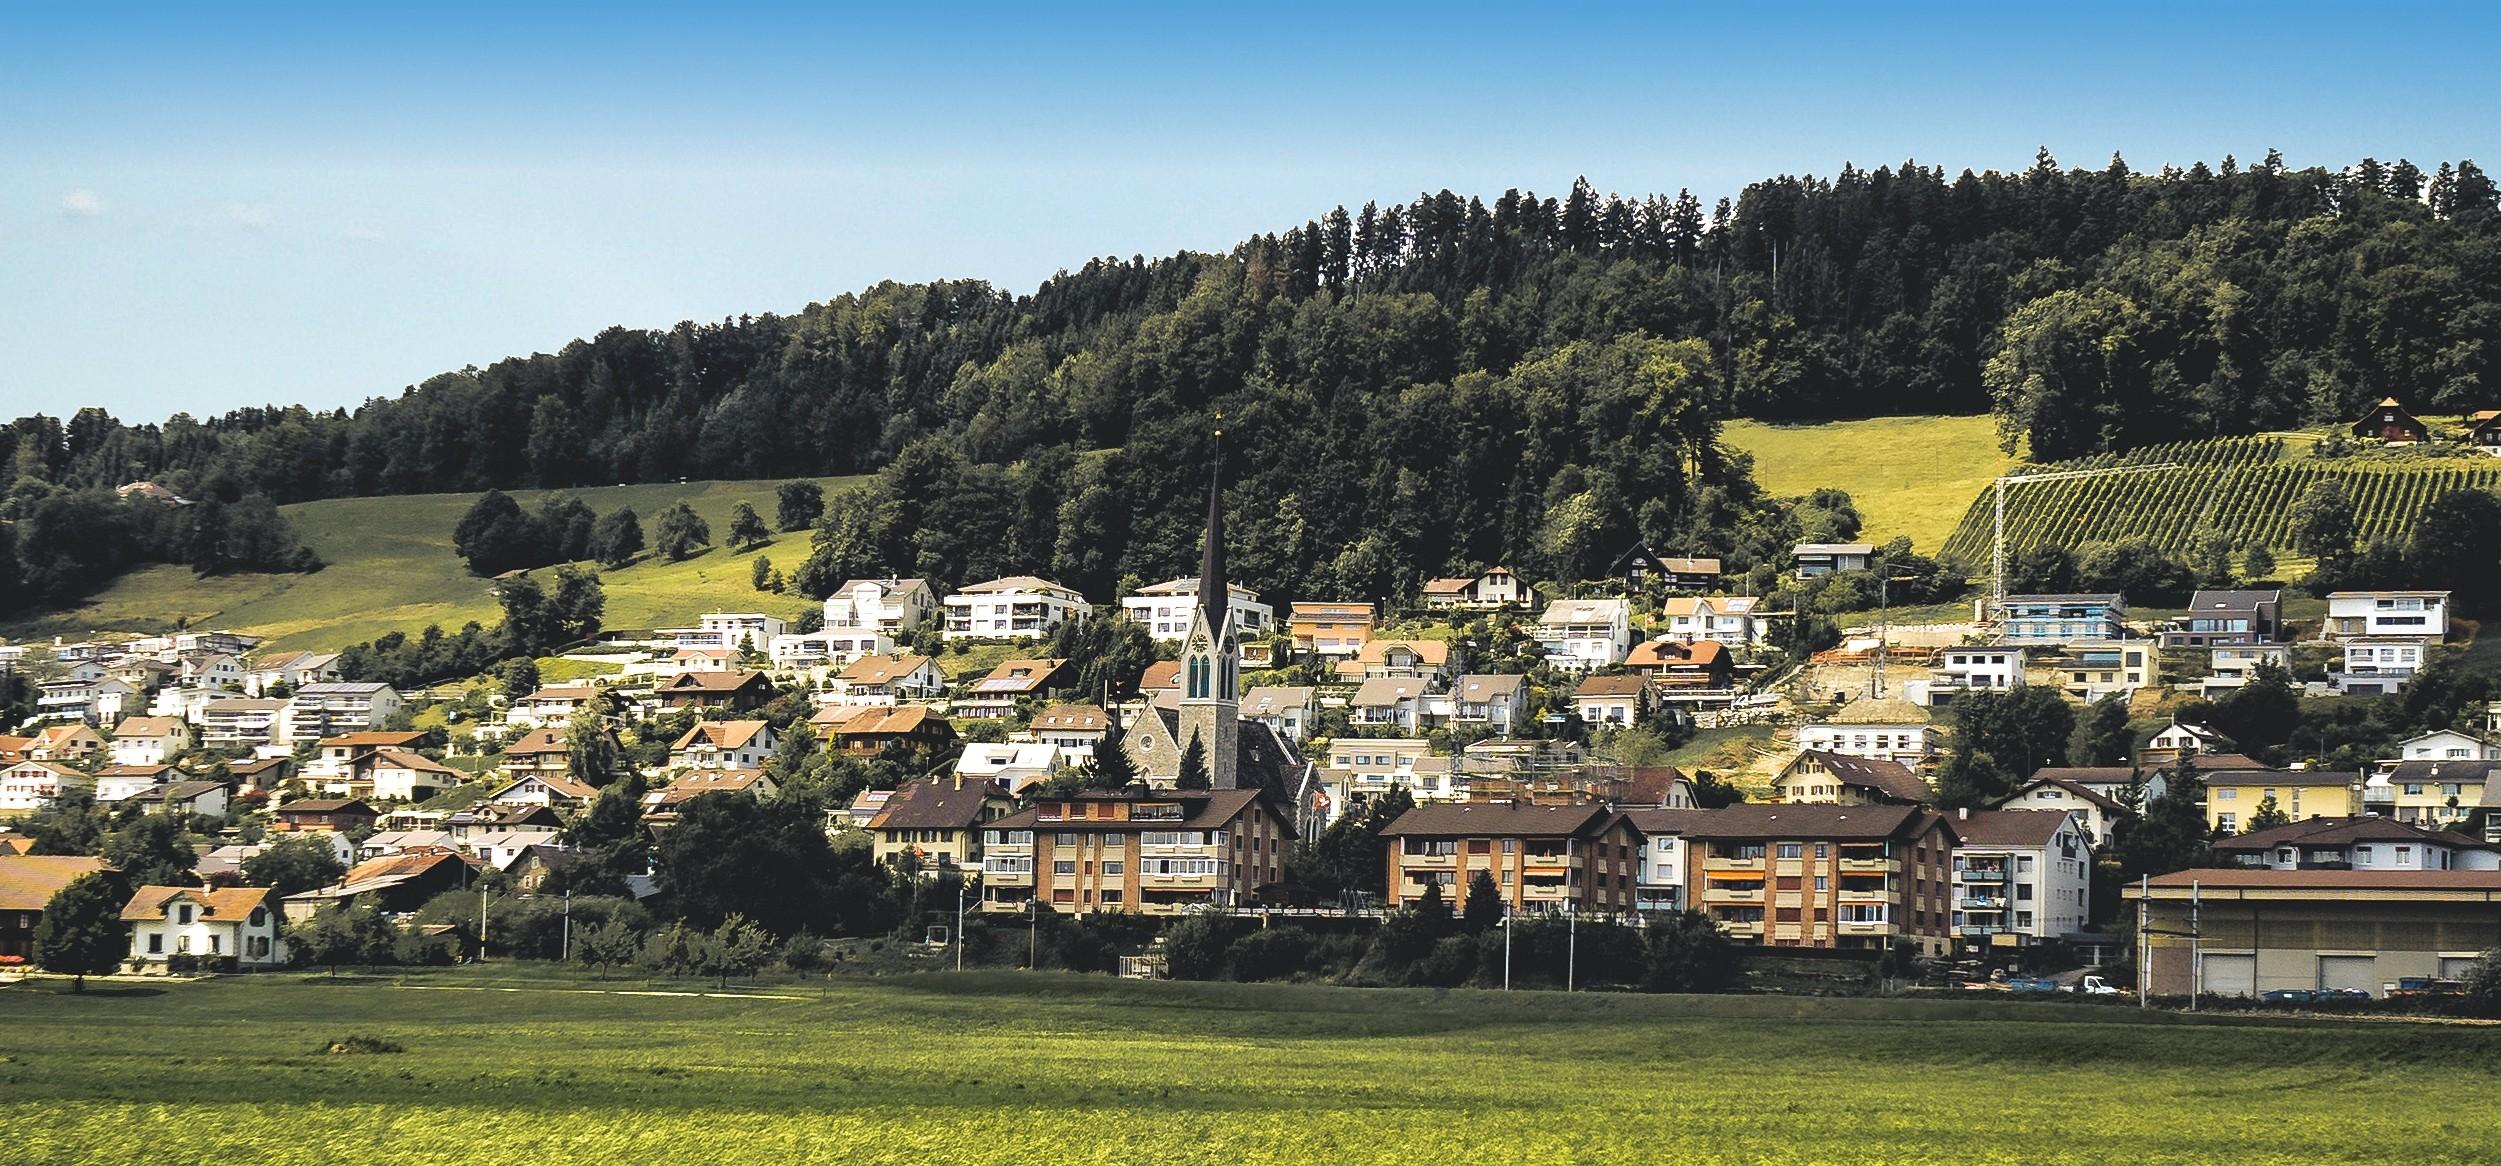 1_05_Egolzwil-Wauwil-Kirche_KeuschM_2501